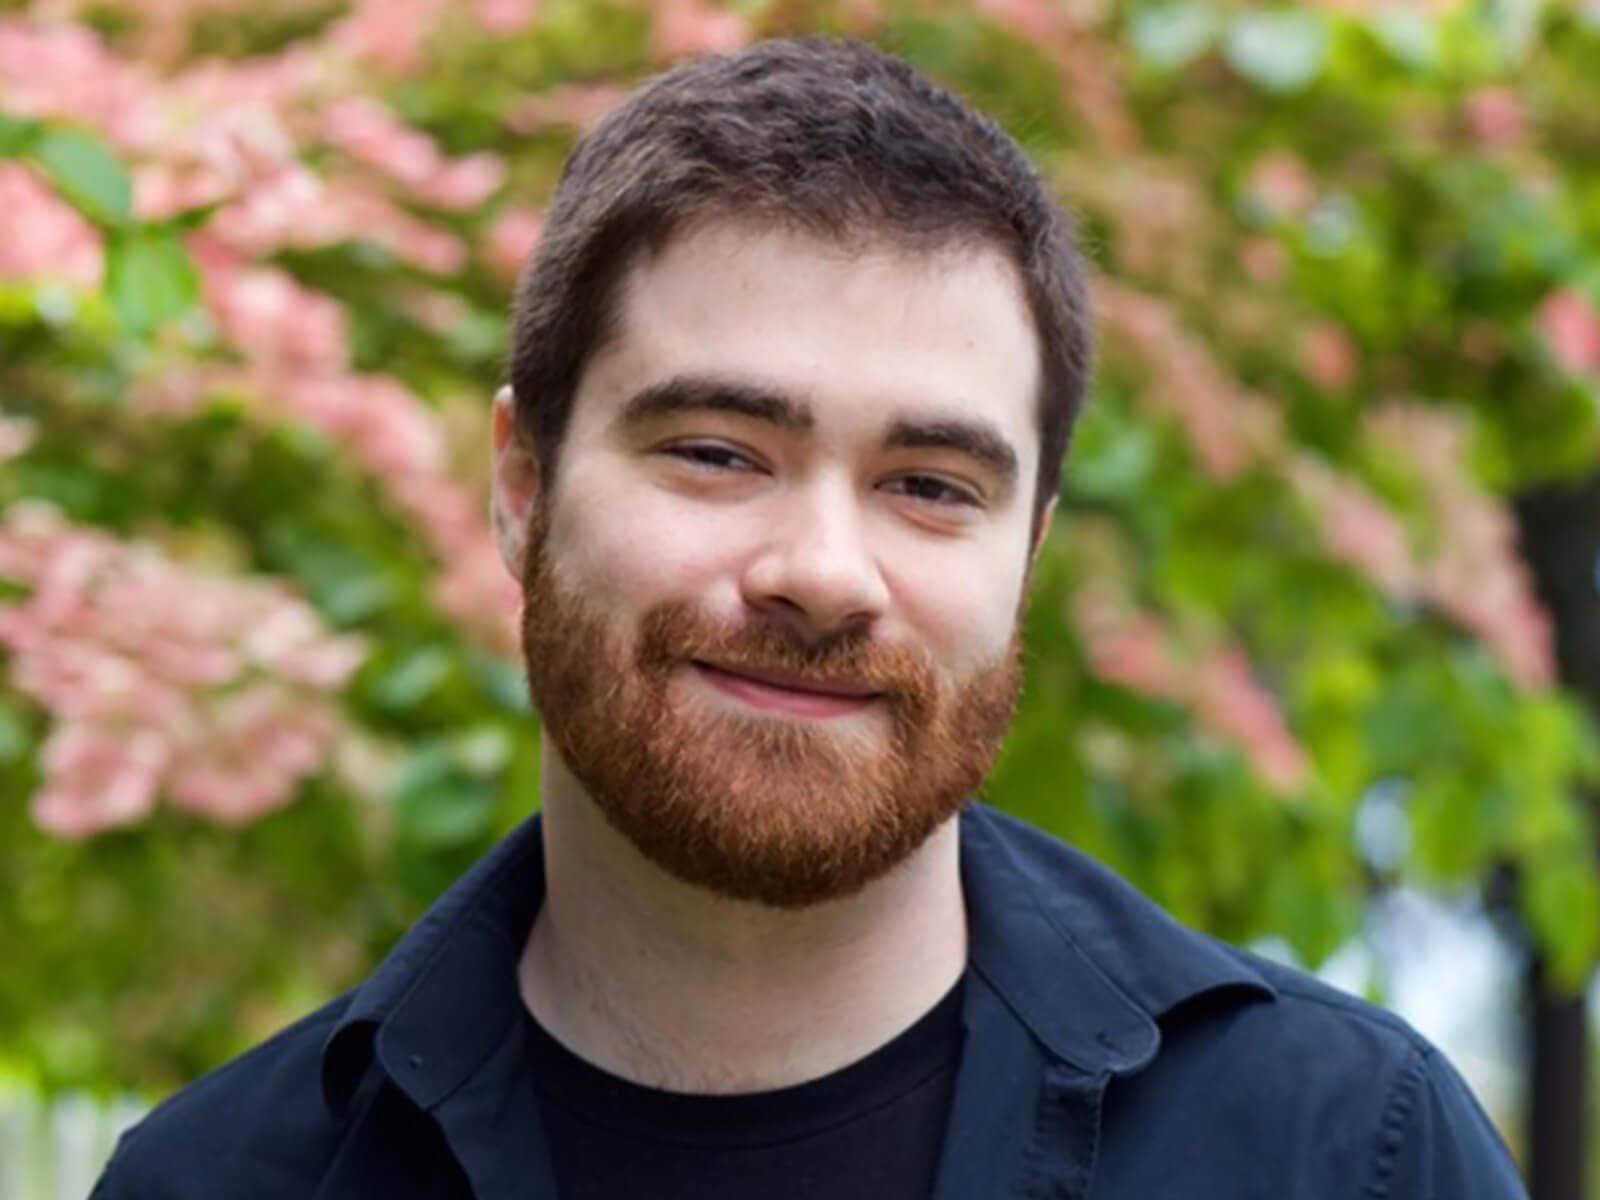 DigiPen BA in Music and Sound Design graduate and V1 Junior Sound Designer, Thomas Parrish.